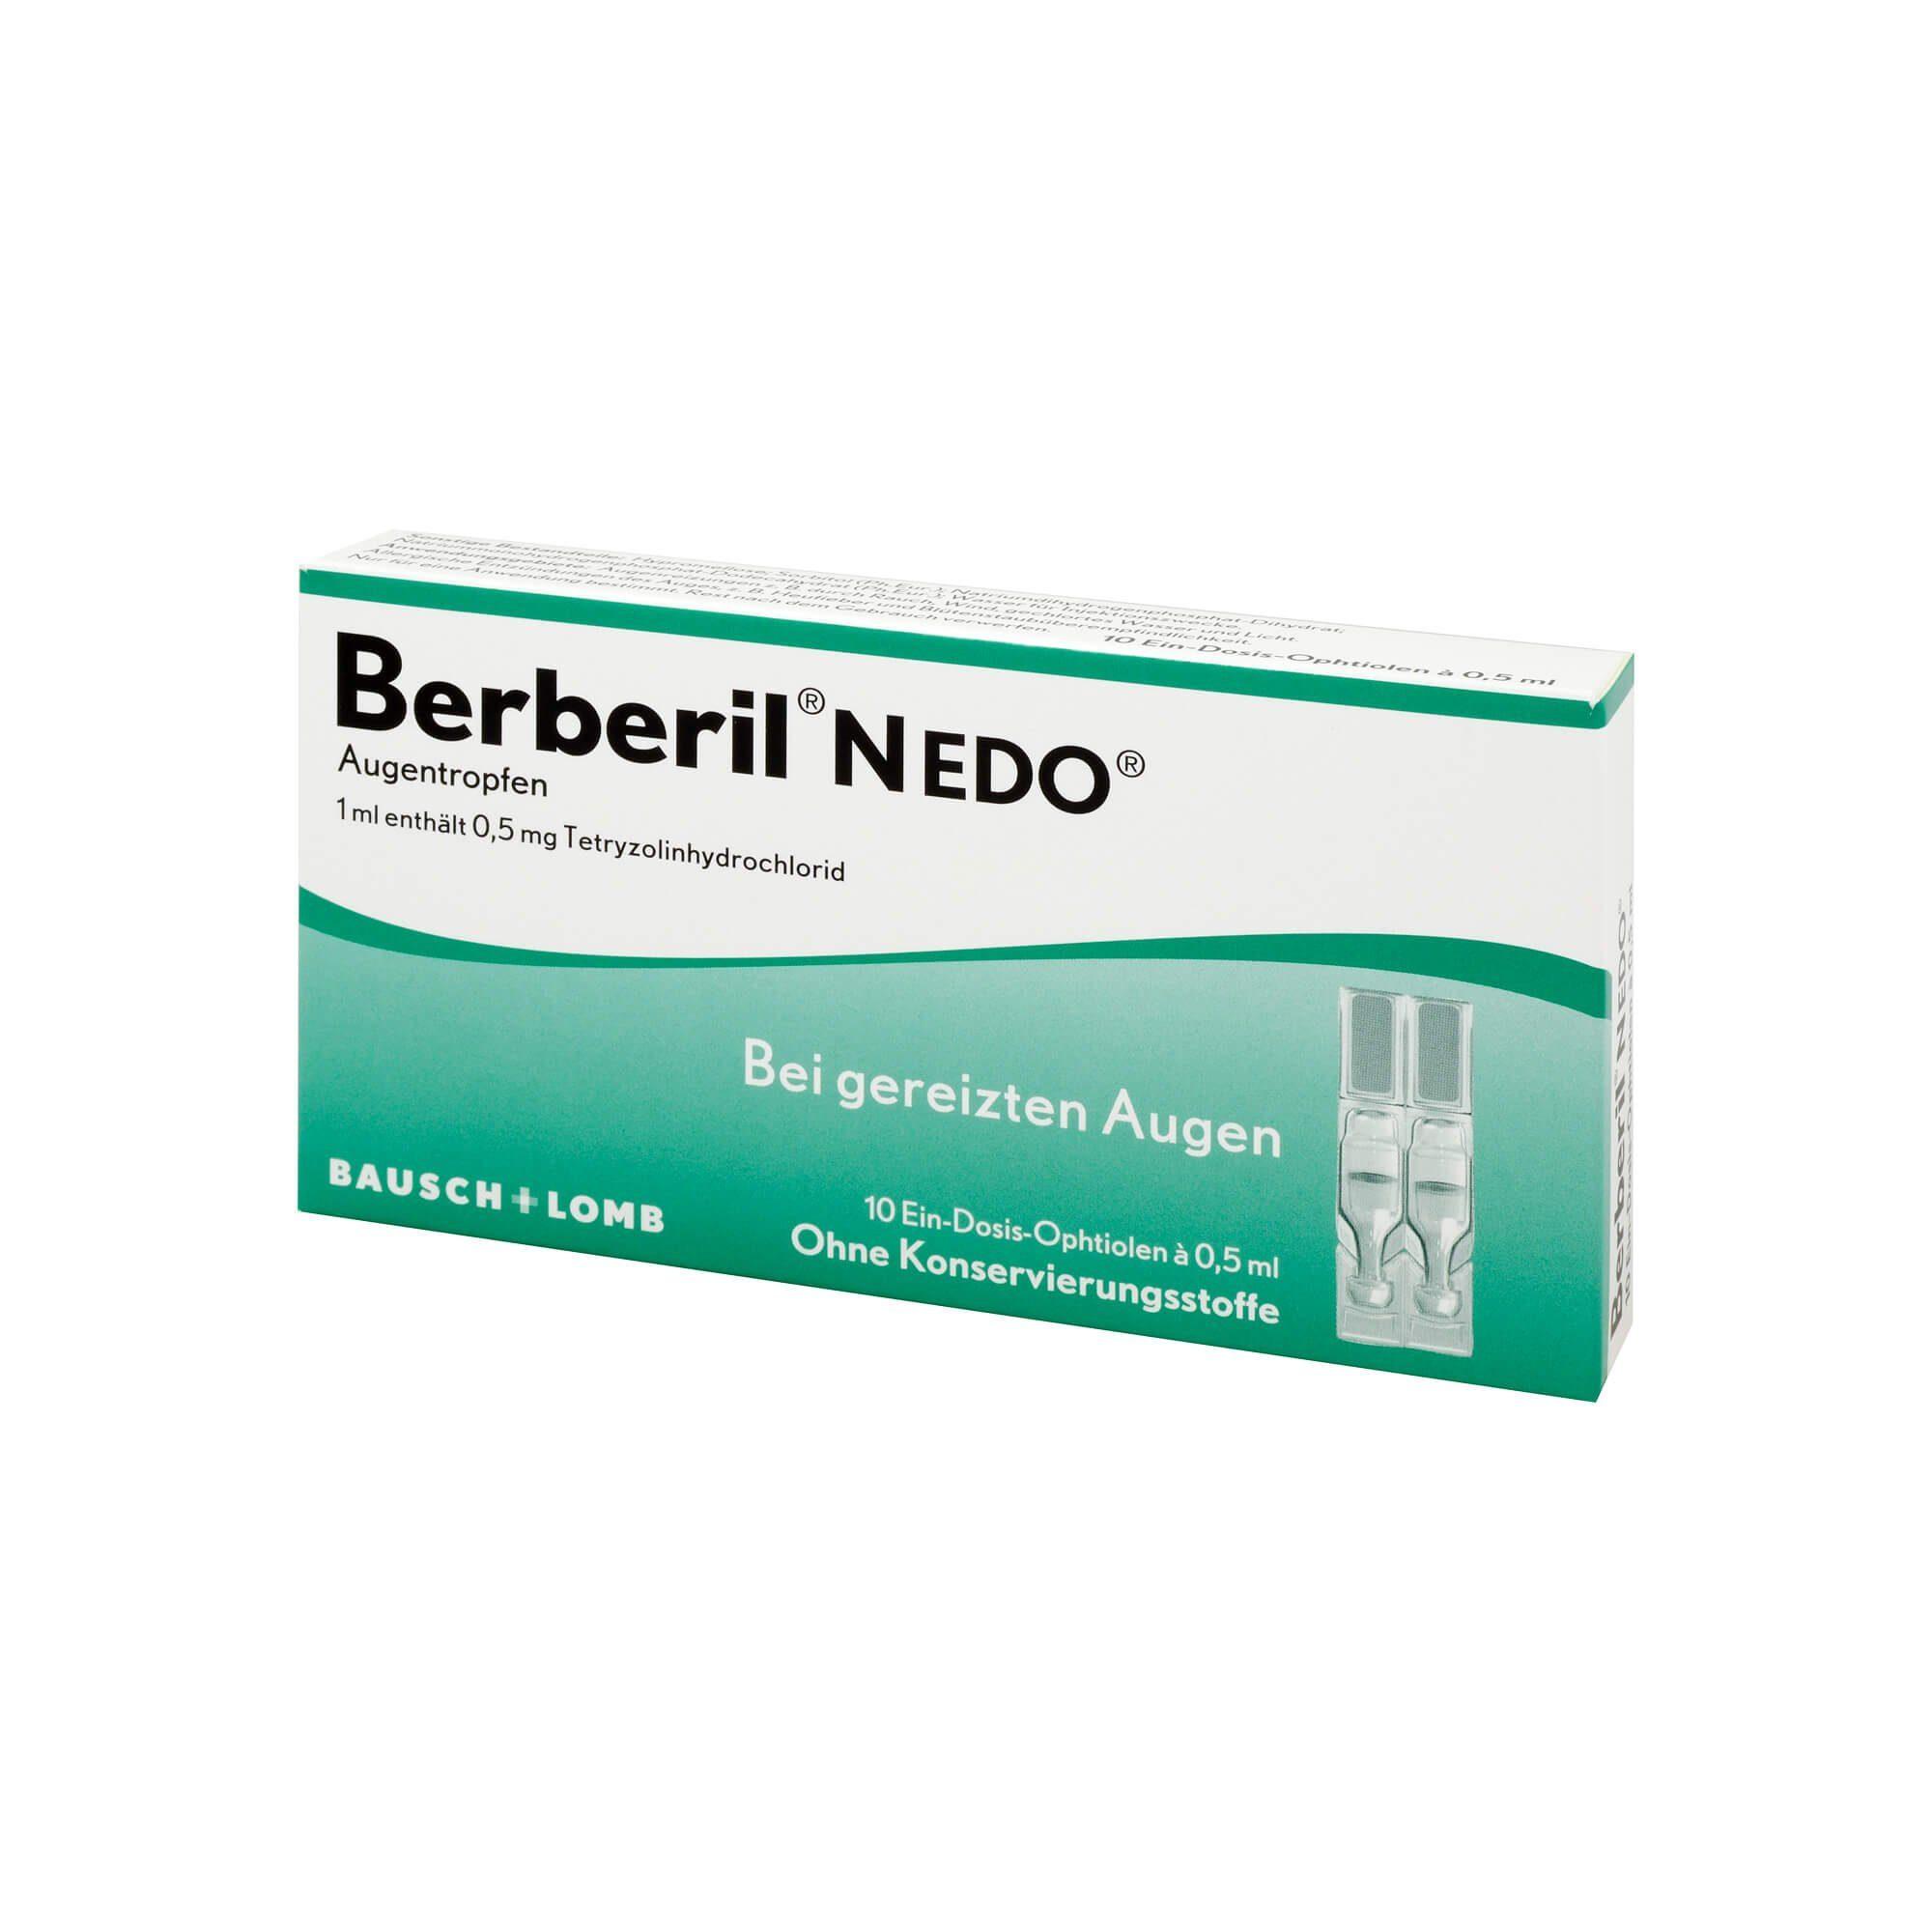 Berberil N Edo Augentropfen, 10X0.5 ml